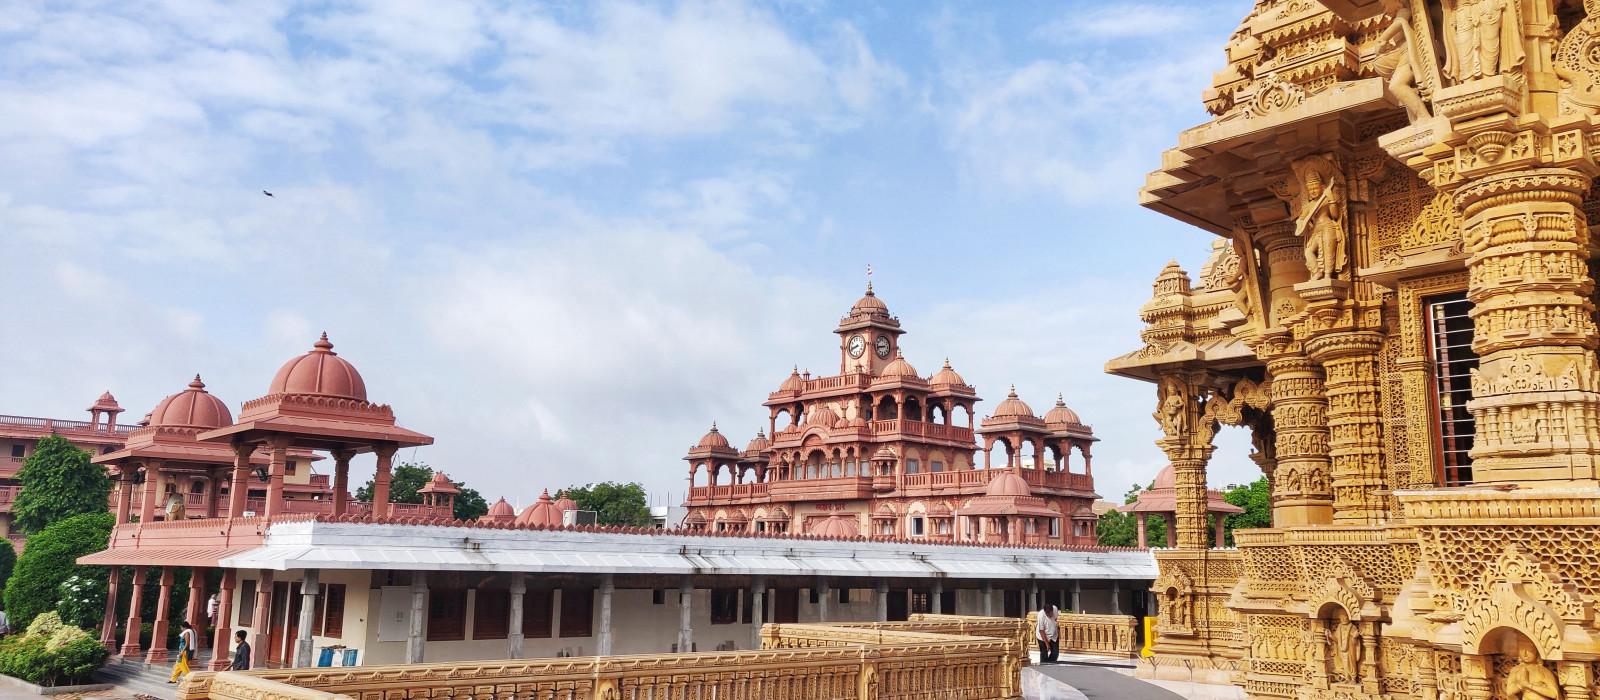 Reiseziel Gondal Zentral- & Westindien